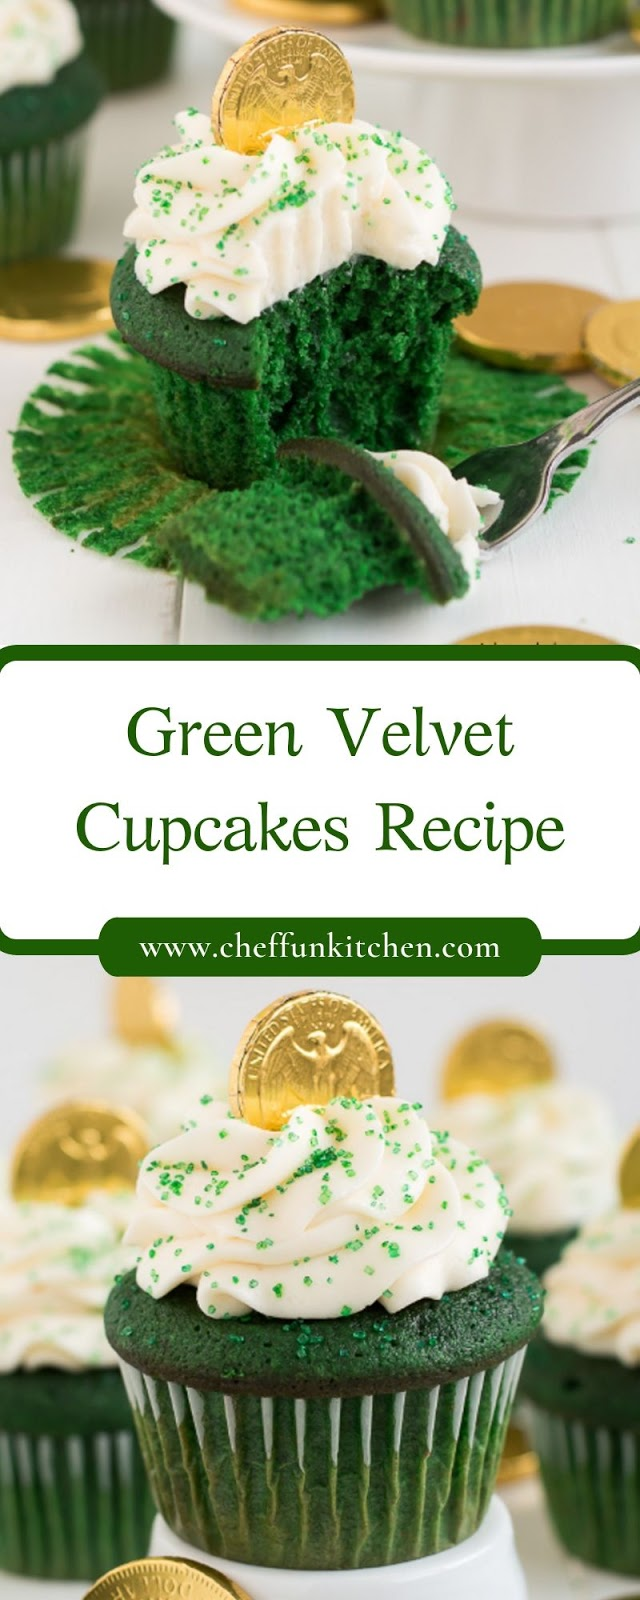 Green Velvet Cupcakes Recipe